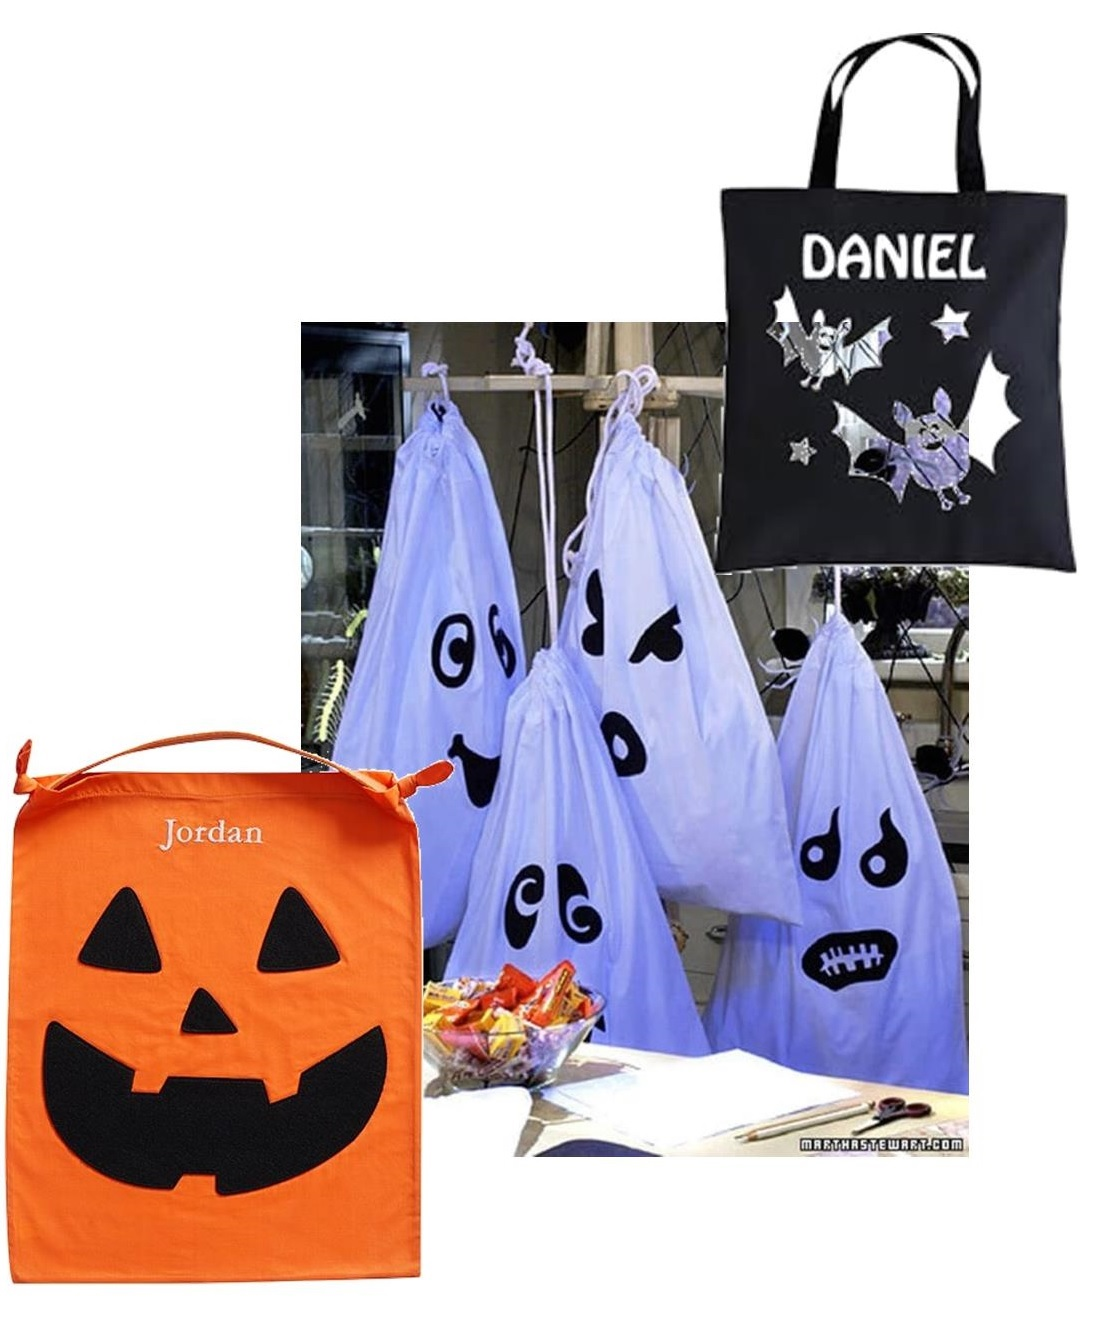 Make a Custom-Designed Halloween Treat Bag